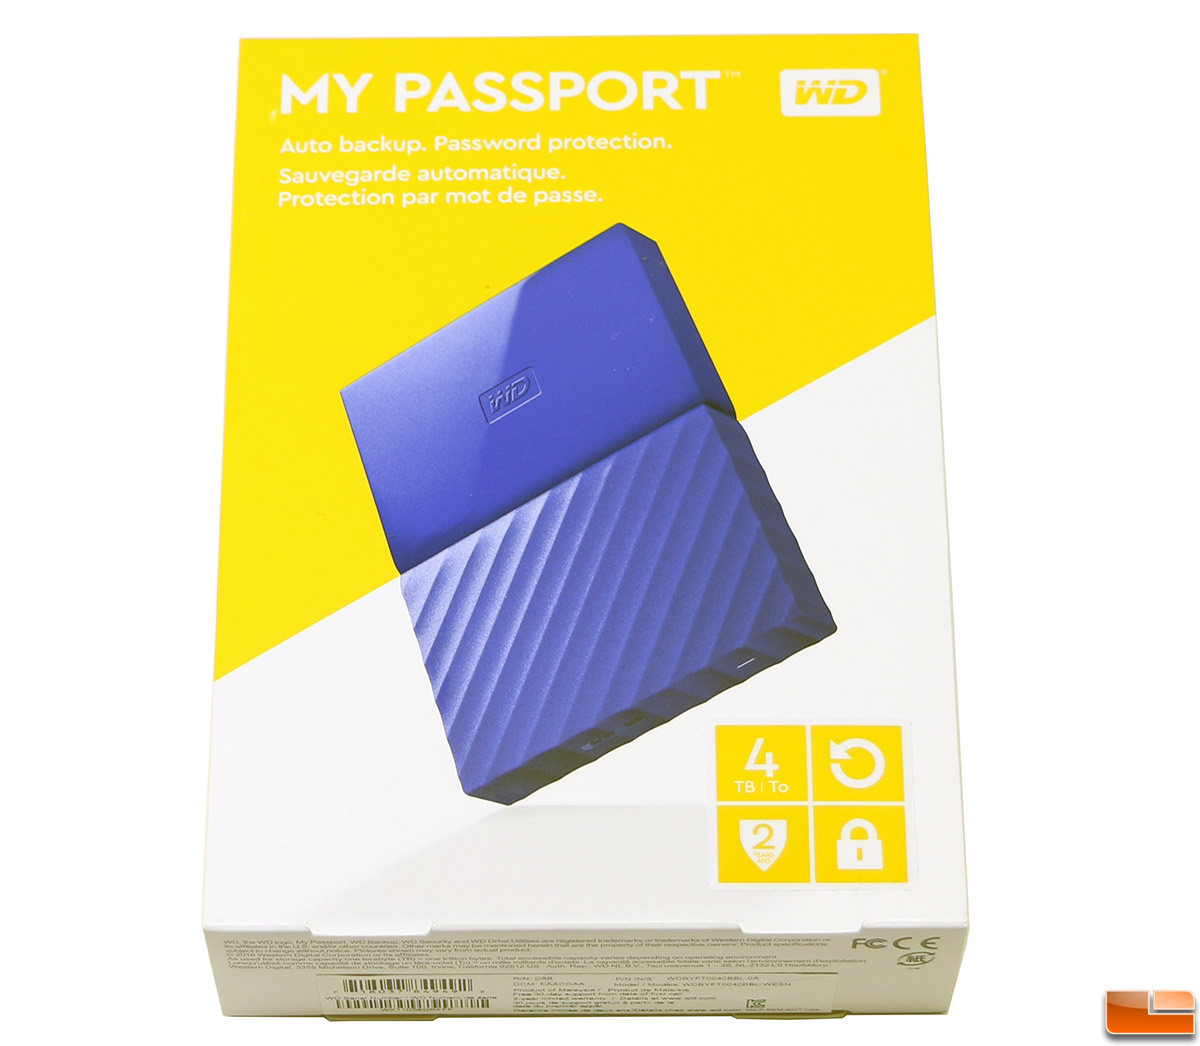 WD My Passport 4TB 2016 Edition Portable External Hard Drive